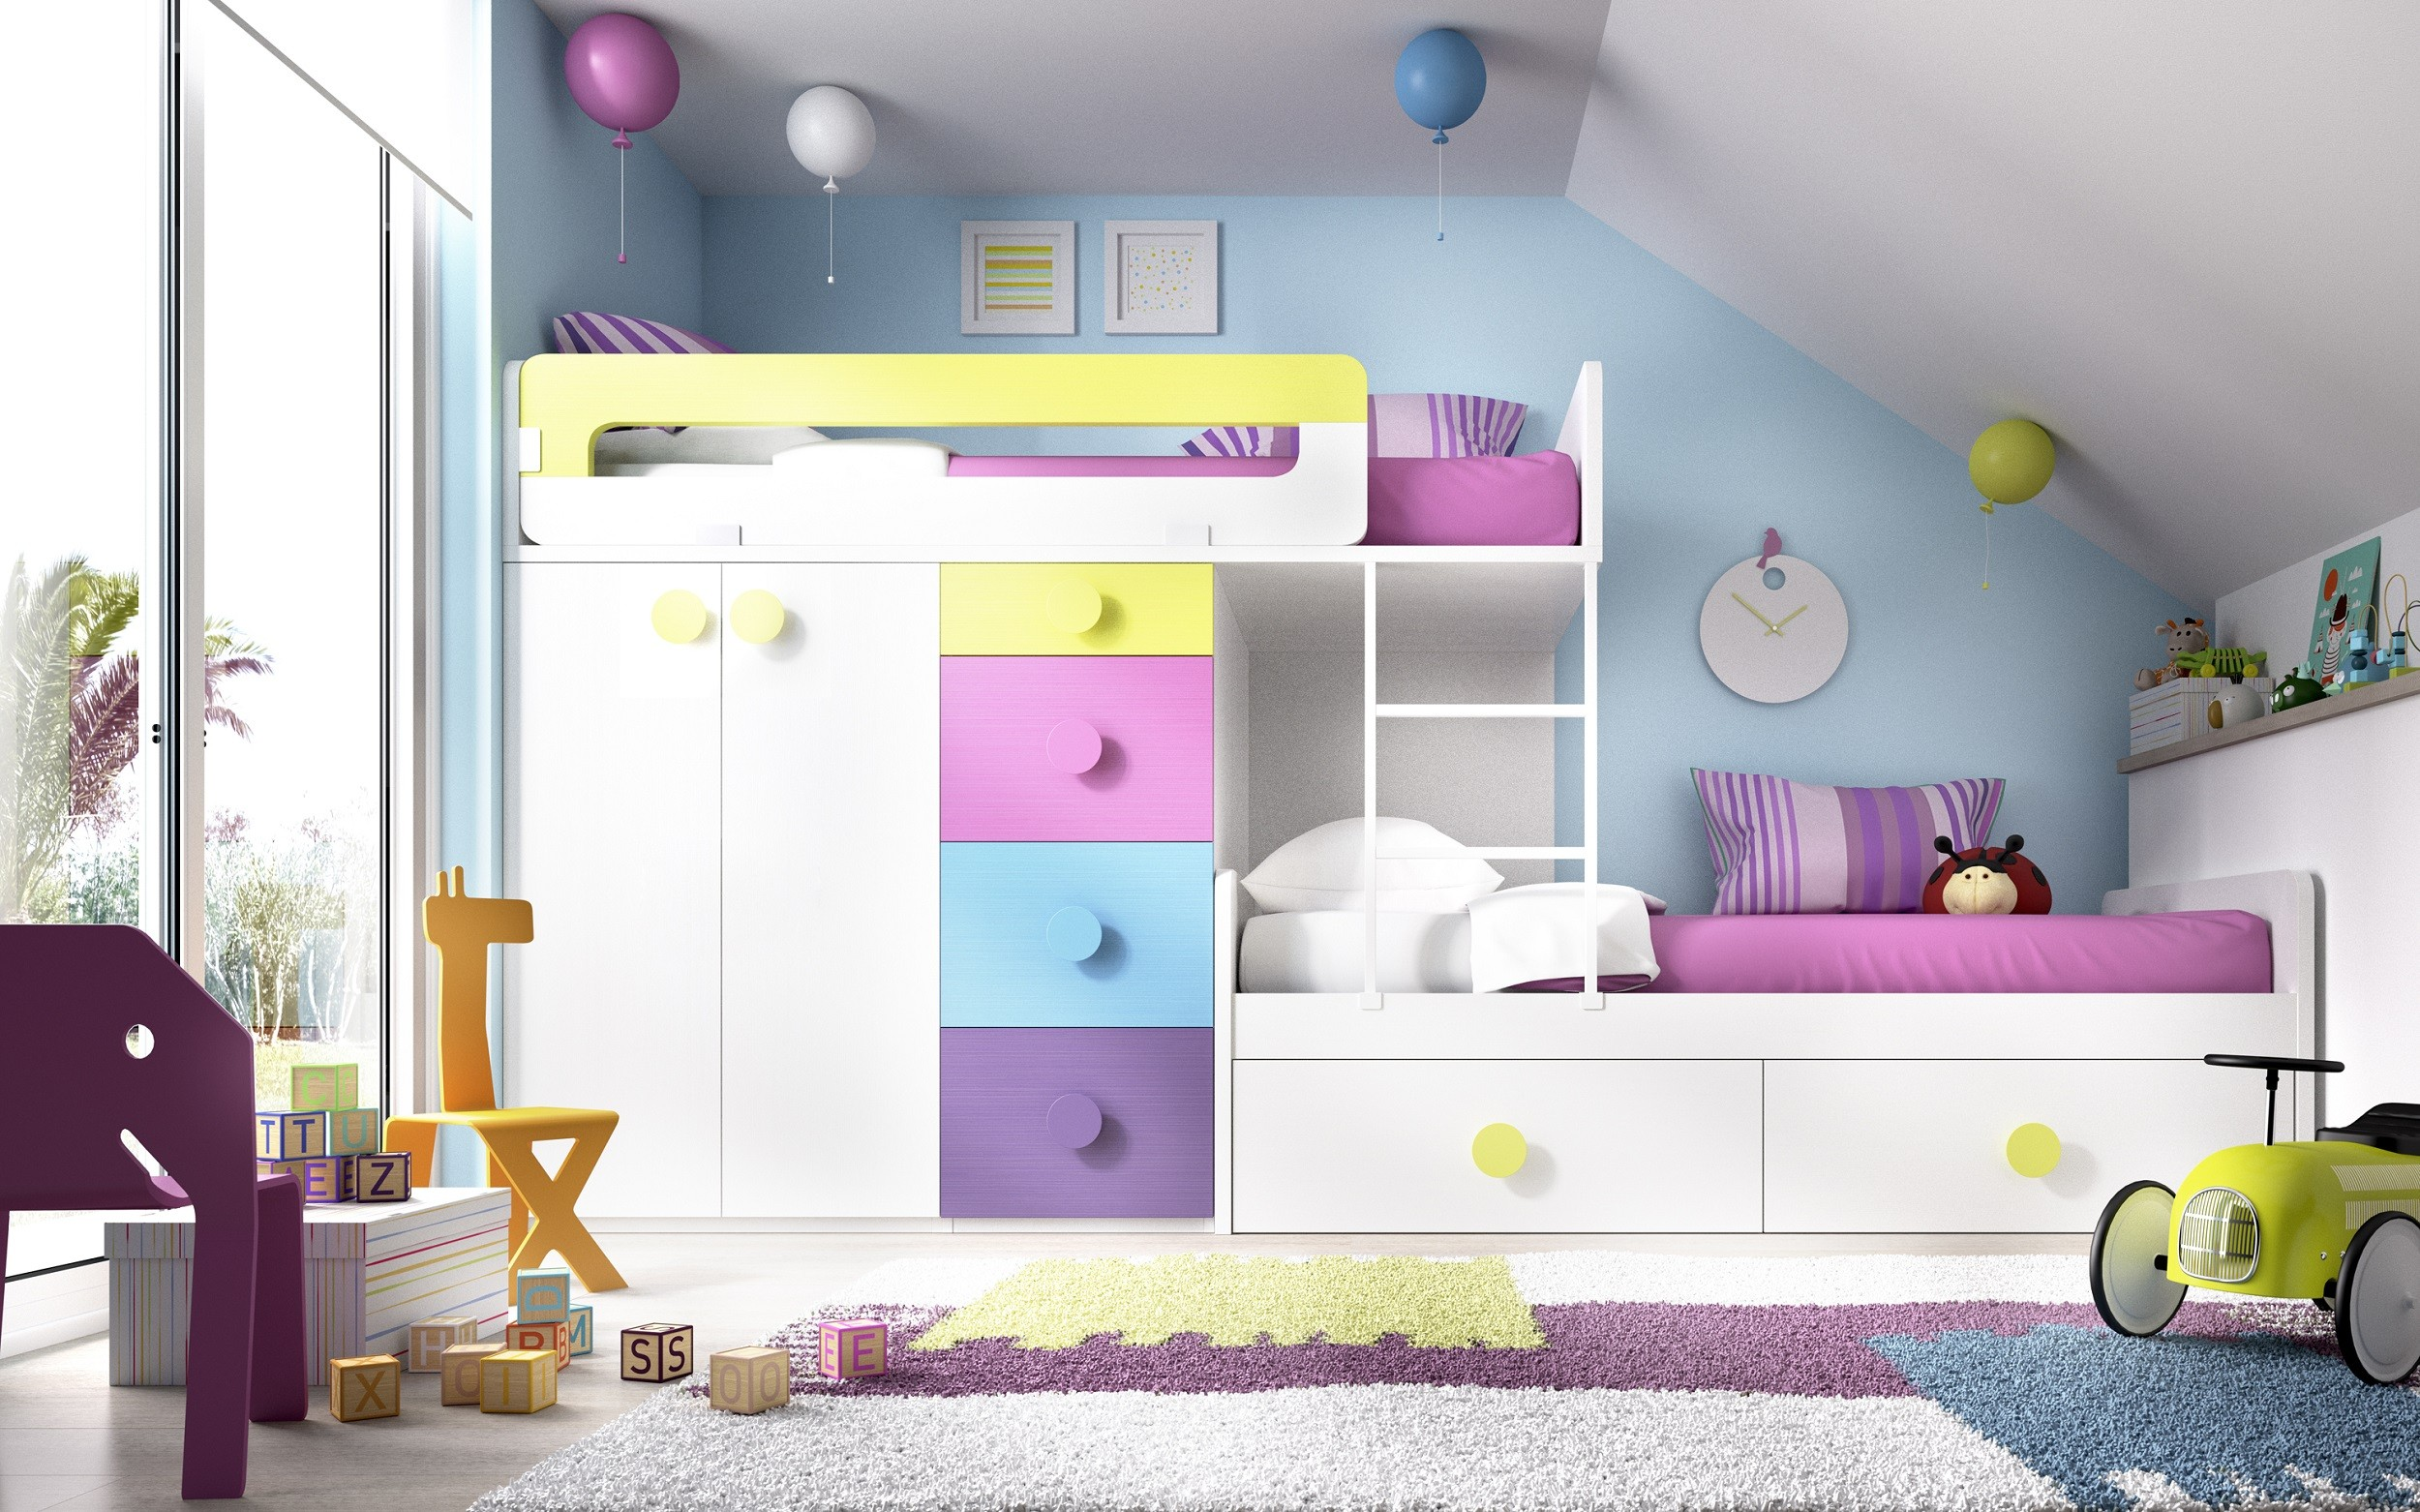 Full Size of Kinderzimmer Regal Regale Weiß Sofa Kinderzimmer Hochbetten Kinderzimmer